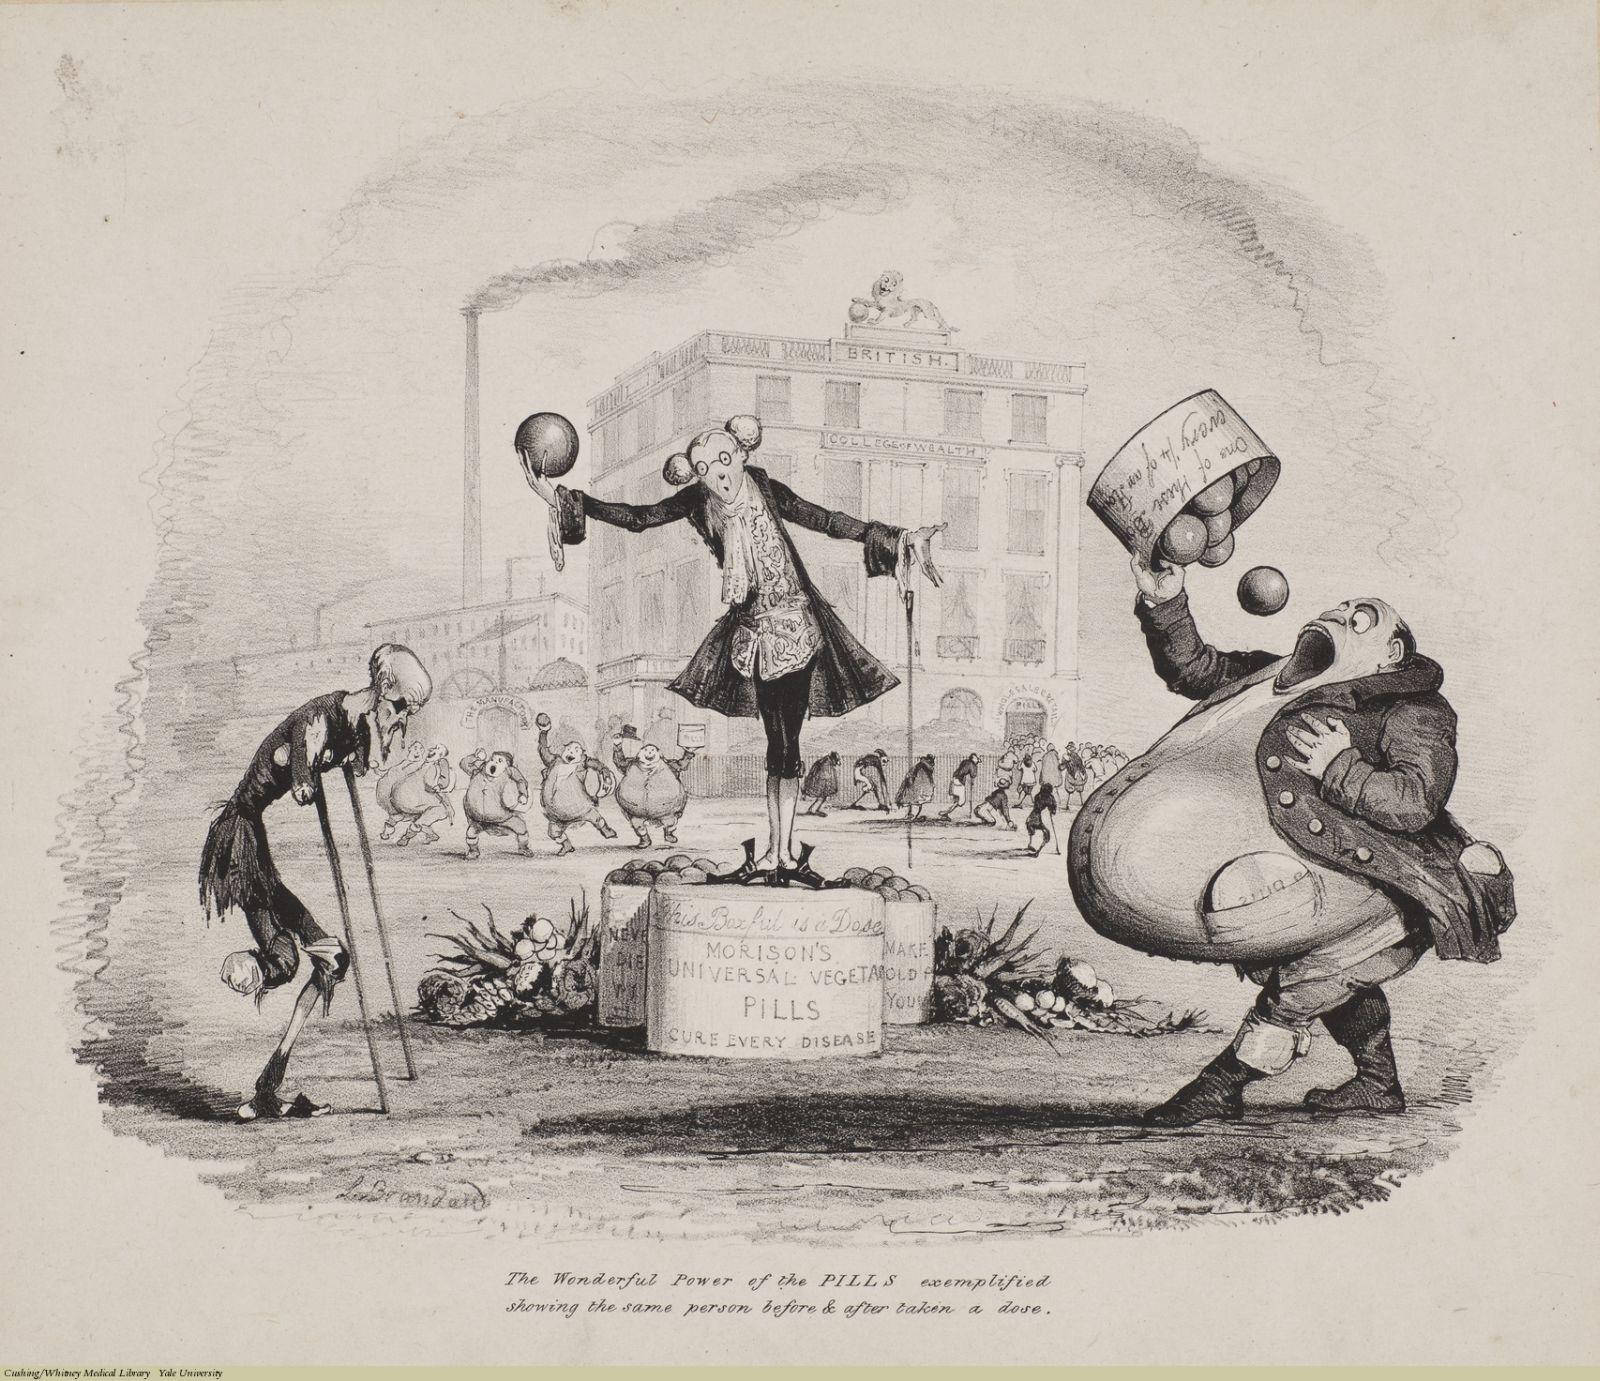 The Wonderful Power of the Pills... John Brandard [ca.1835]. Subject: Quacks & Quackery, Drugs, Proprietary Medicines, James Morison, Morison's Pills, College of Medicine.